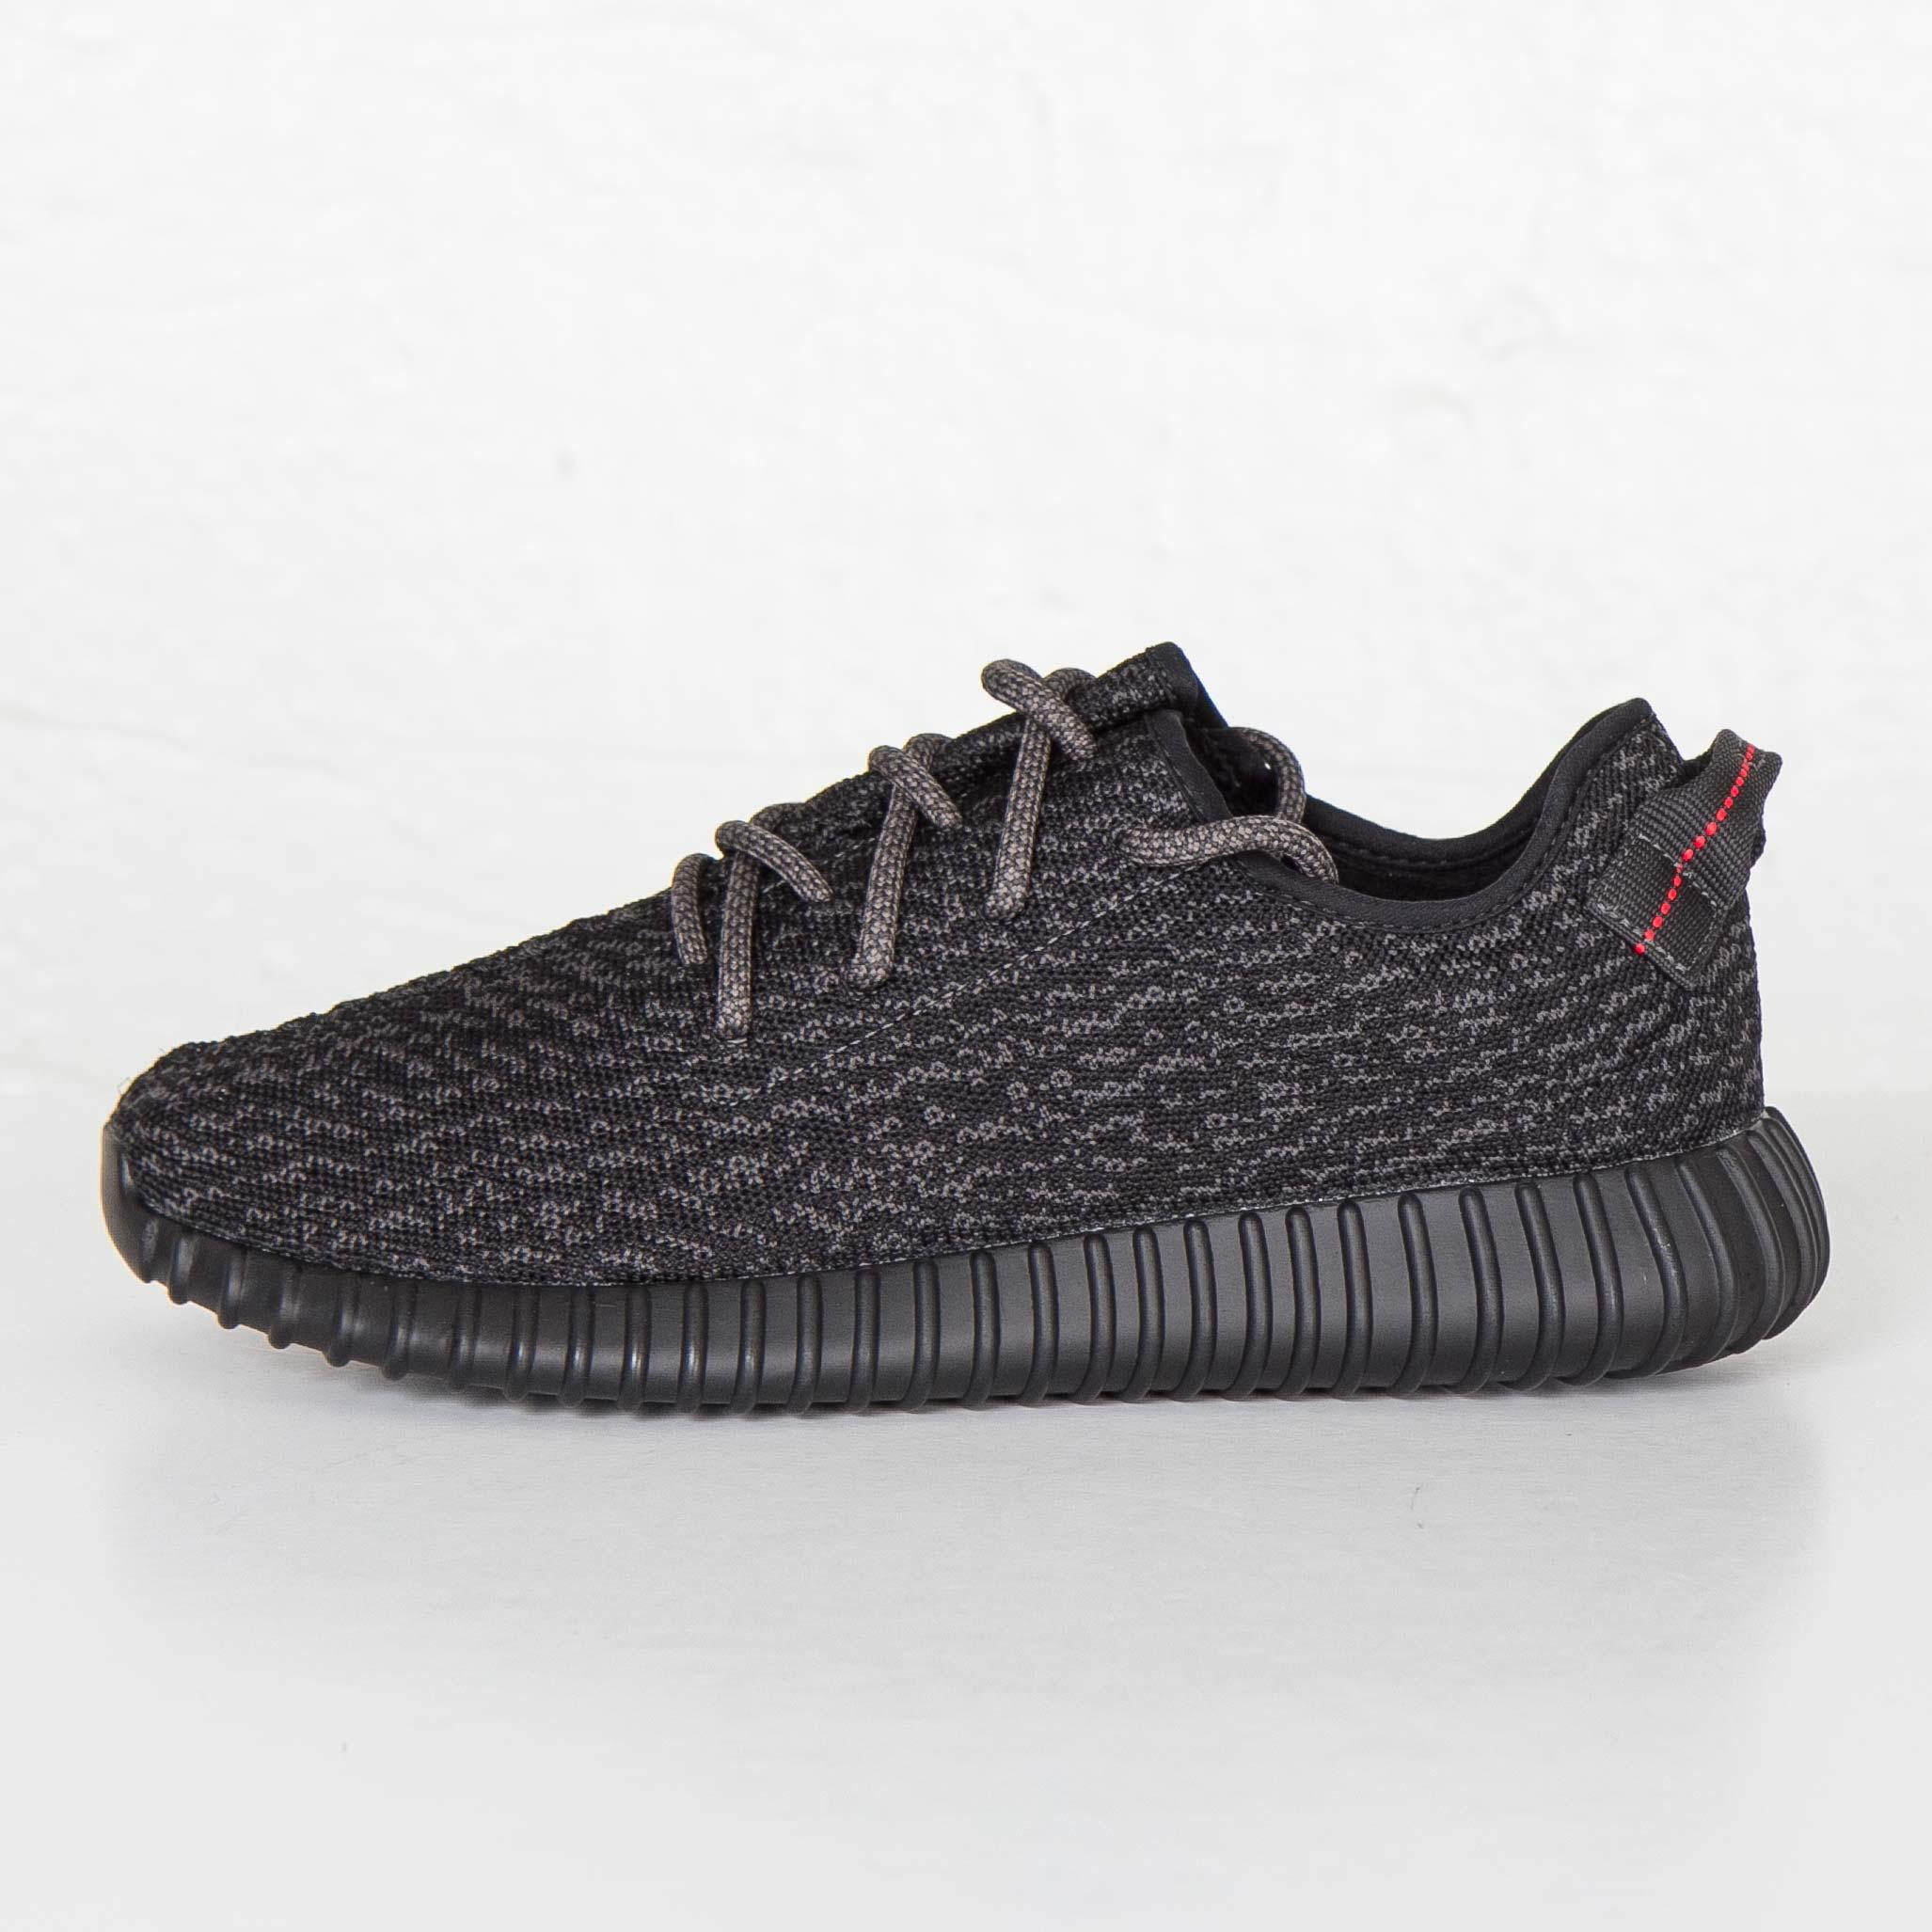 e4e6dcce6c2 ... adidas Originals x Kanye West Yeezy Boost 350 ...